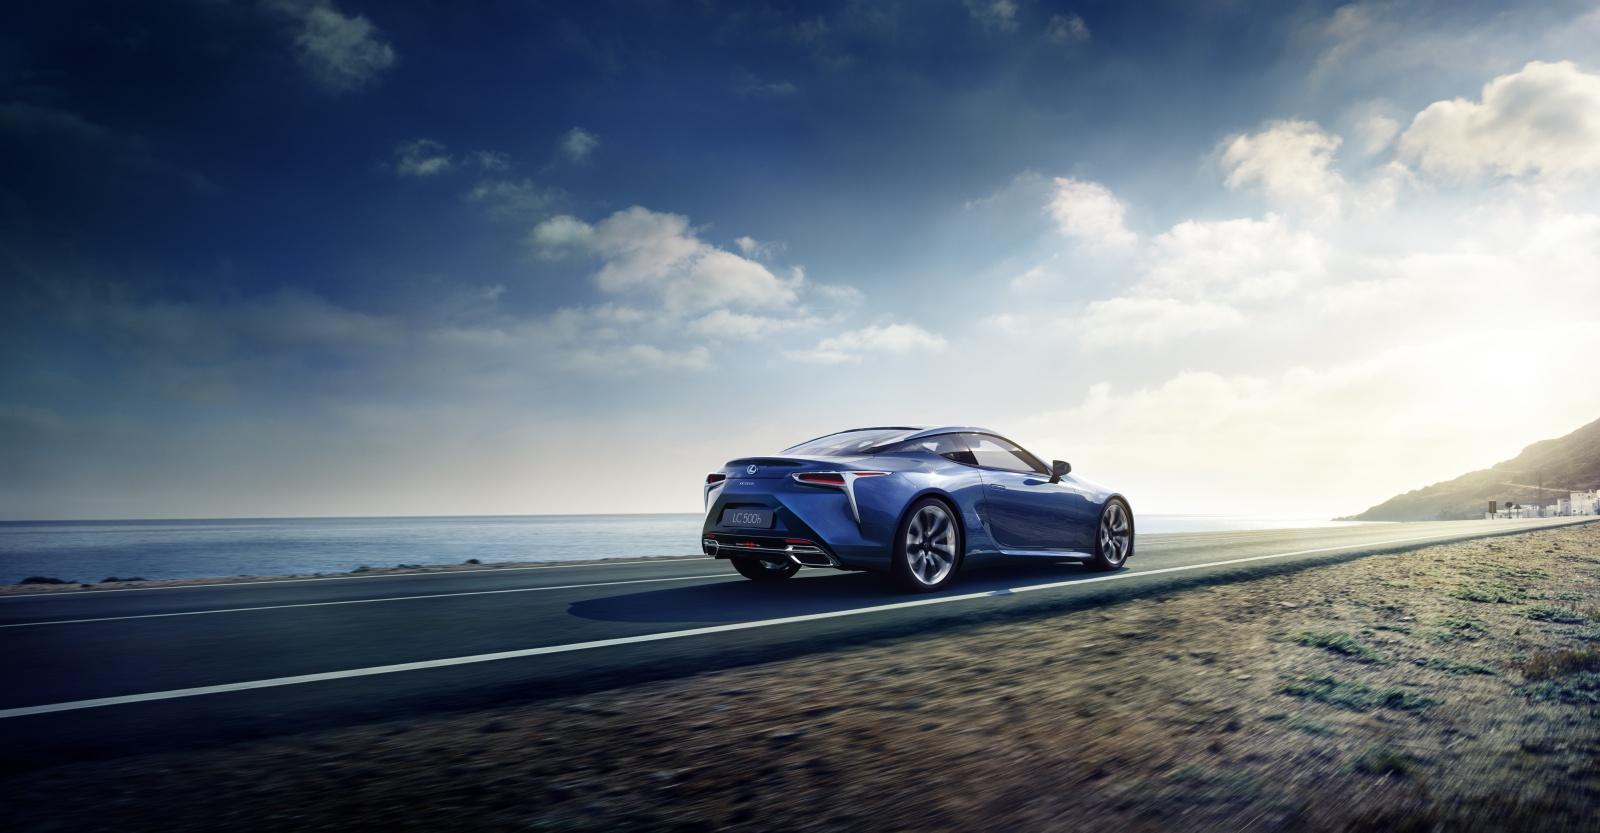 Lexus_LC_500h_002_9B06EA9758FC345BF8EFD76B6054B9AEDC681FA6